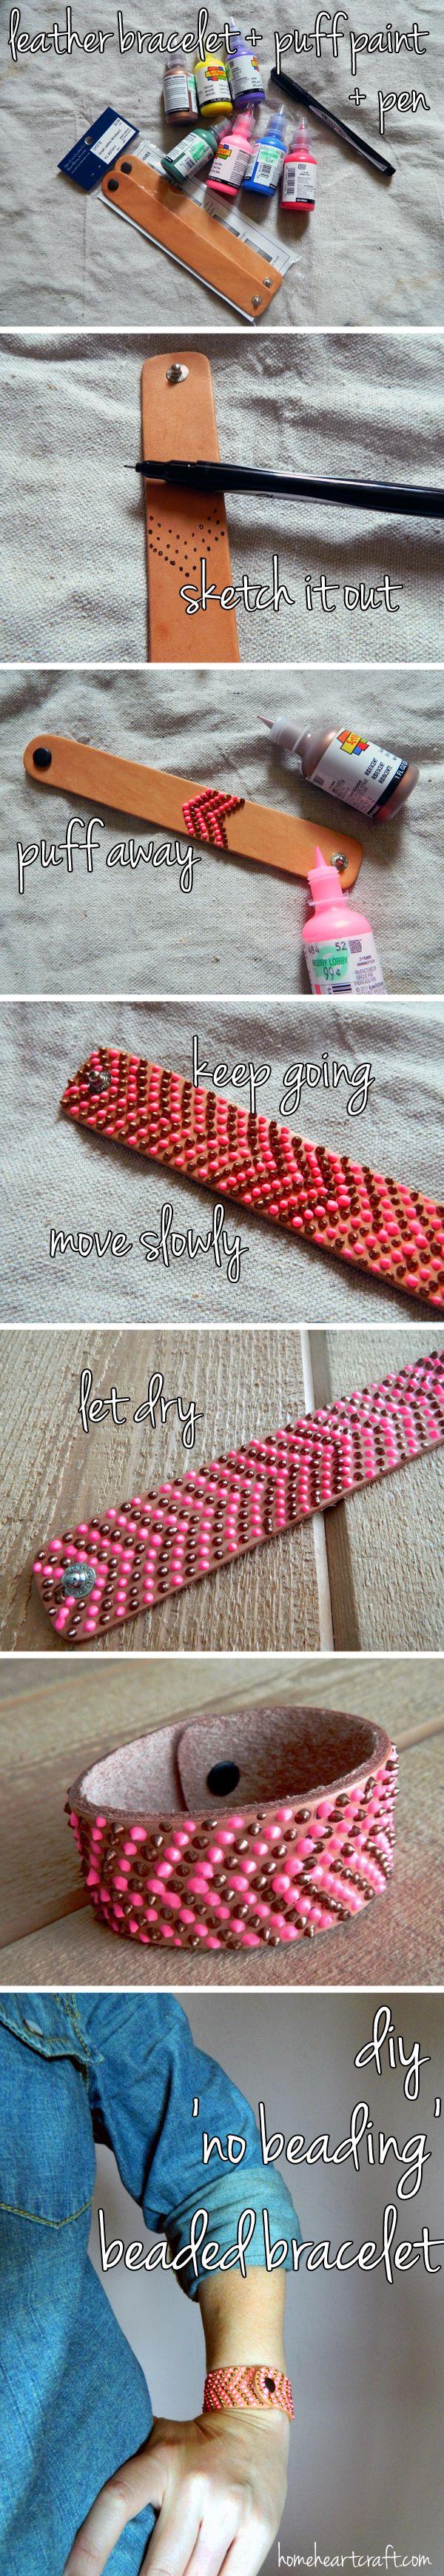 Diy indian beaded bracelet sooo cute for my girls pinterest